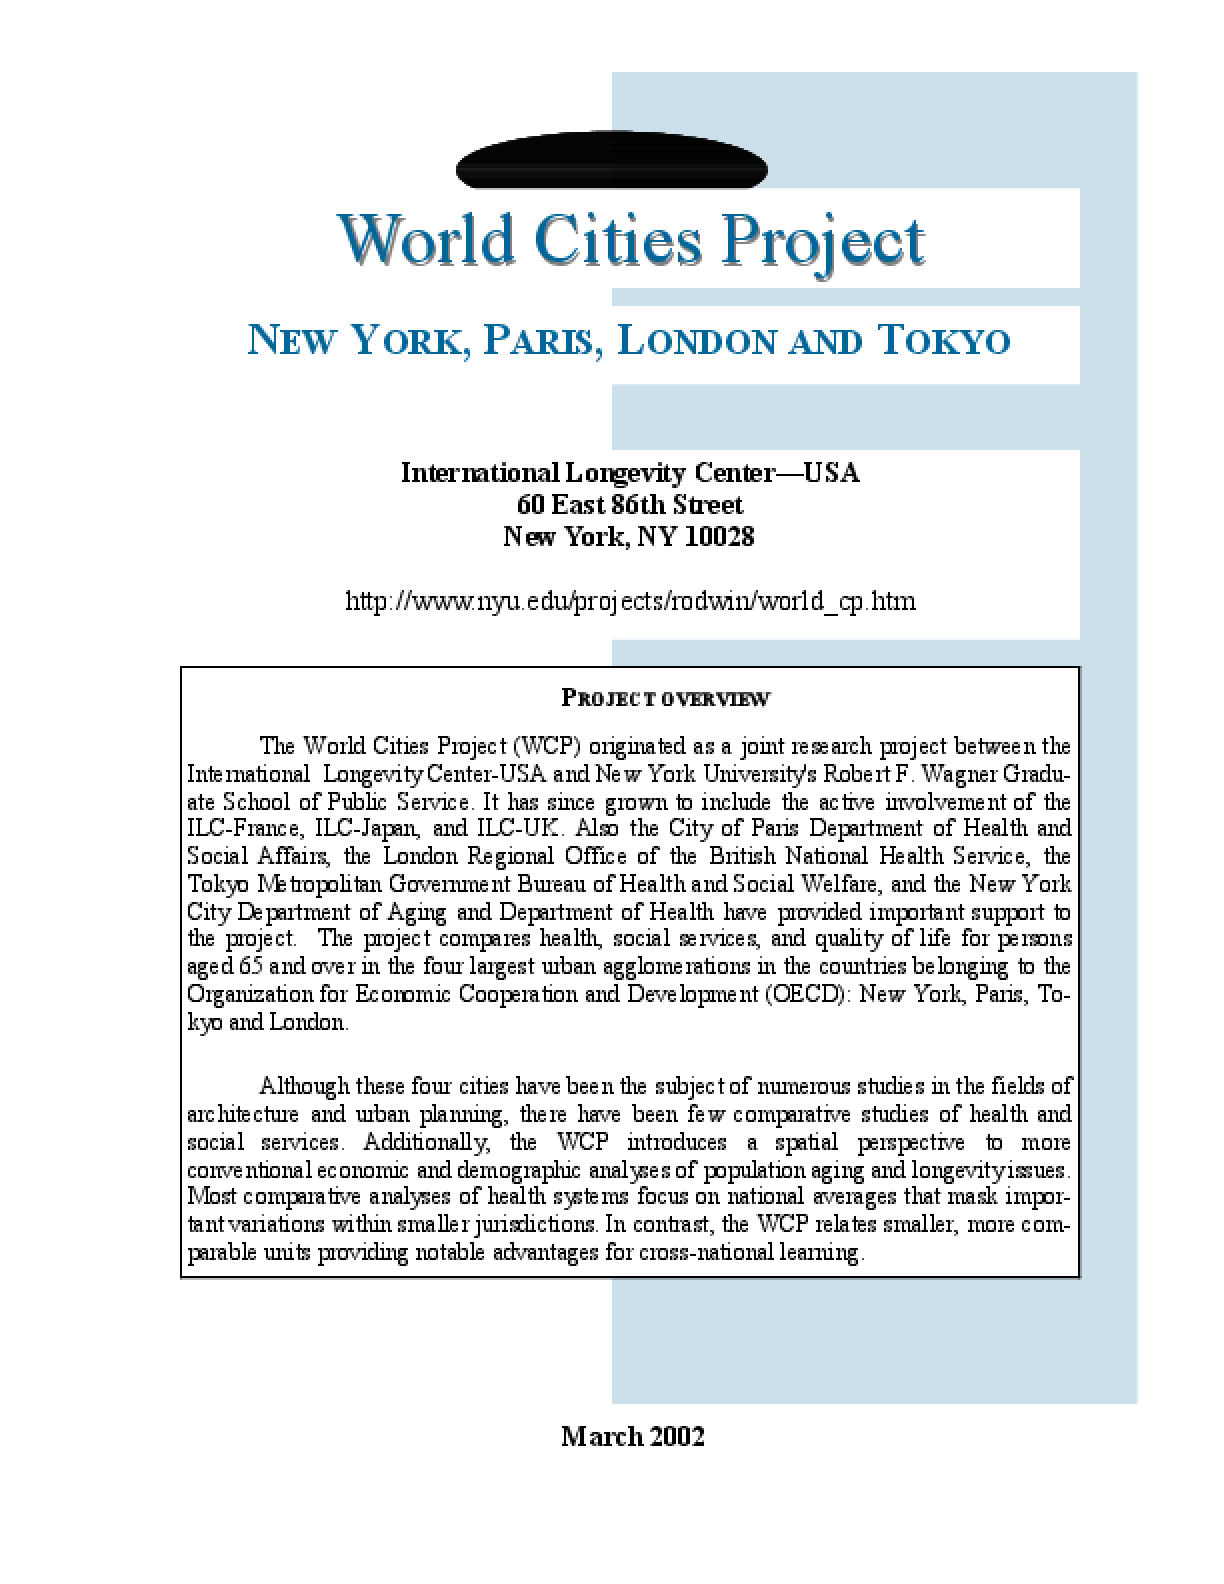 World Cities Project: New York, Paris, London, Tokyo Fact Sheet